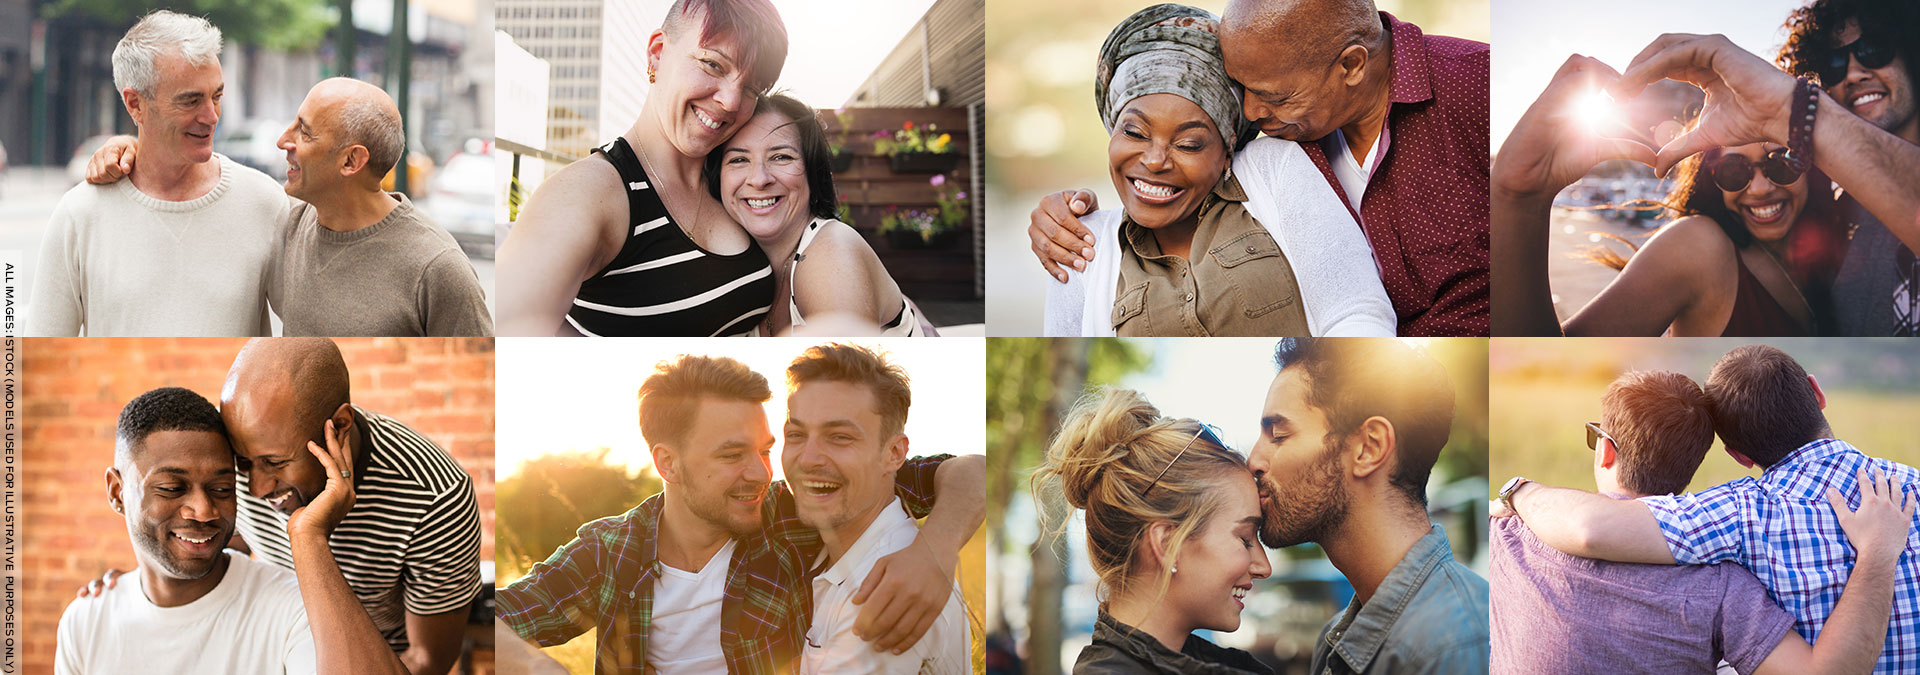 Kvadrat pitagora online dating